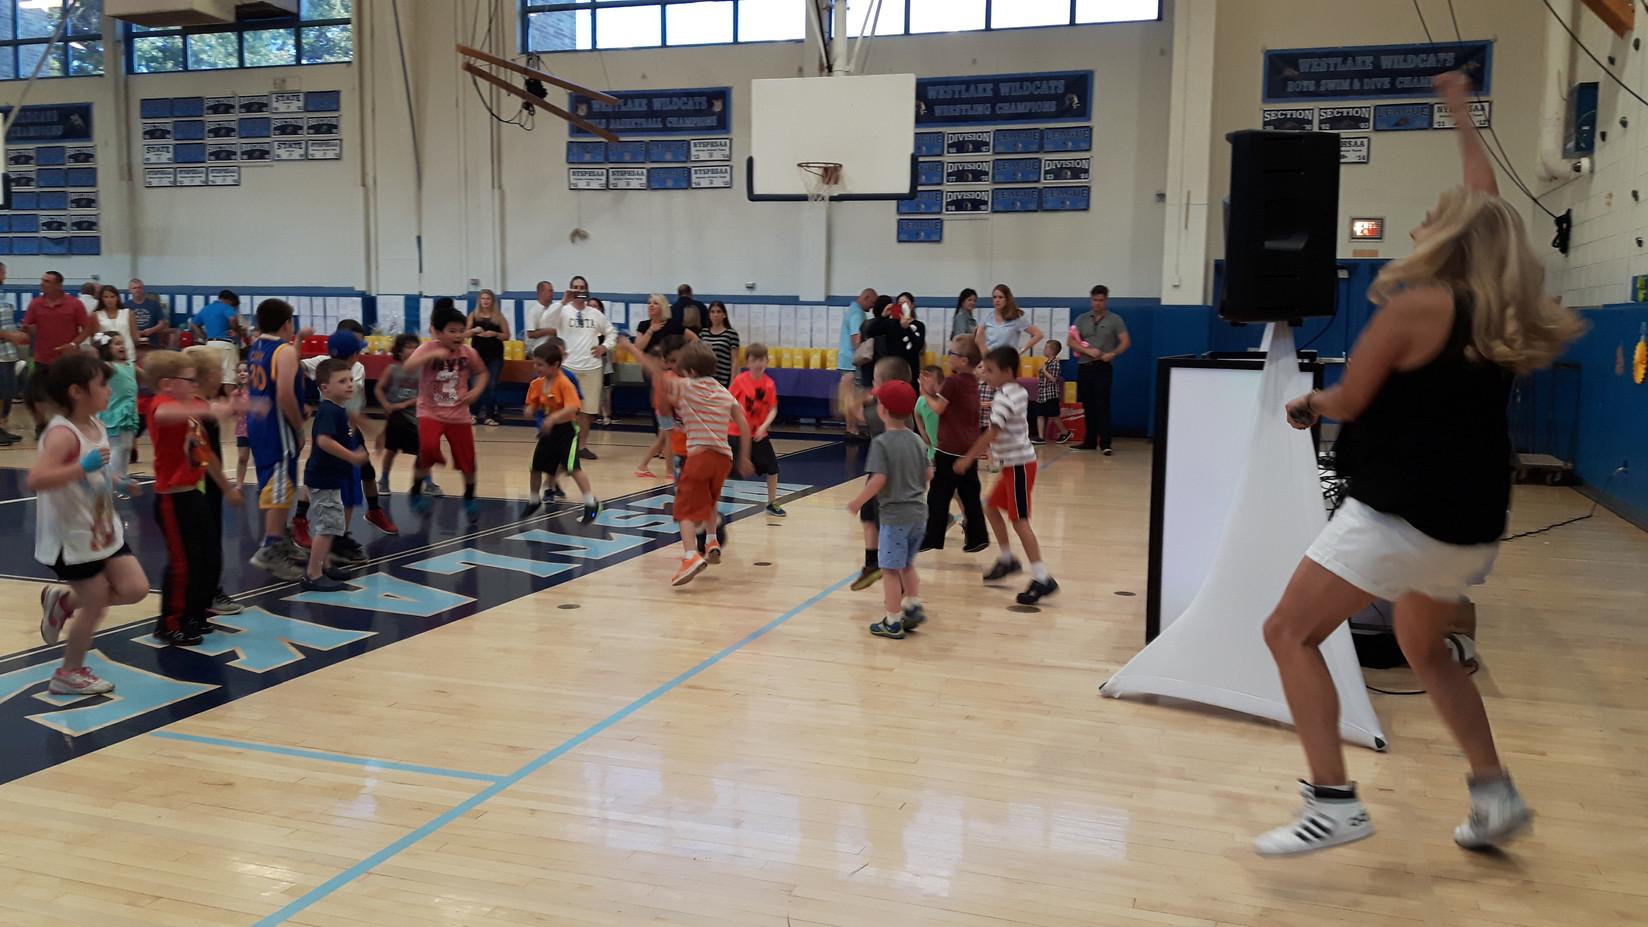 Kids-Dance-Activity-At-School.jpg